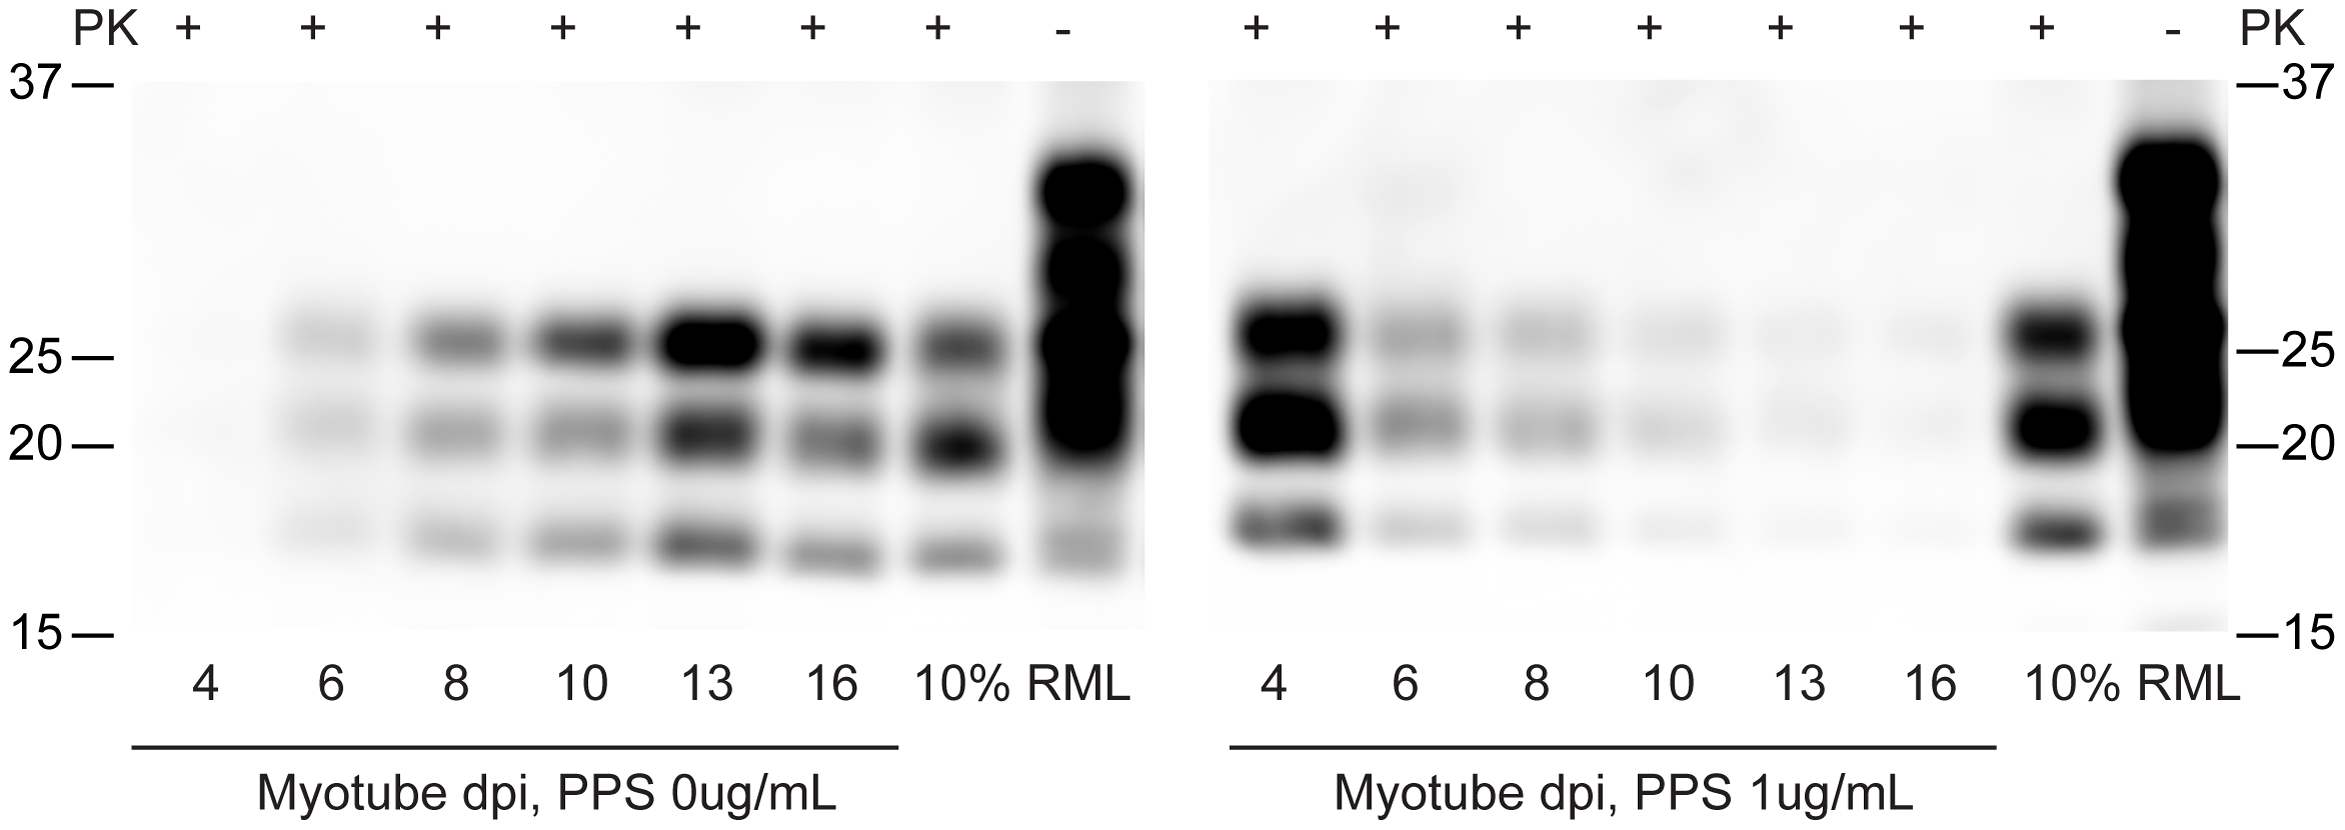 Pentosan polysulfate inhibits PrP<sup>Sc</sup> accumulation in C2C12 myotubes.